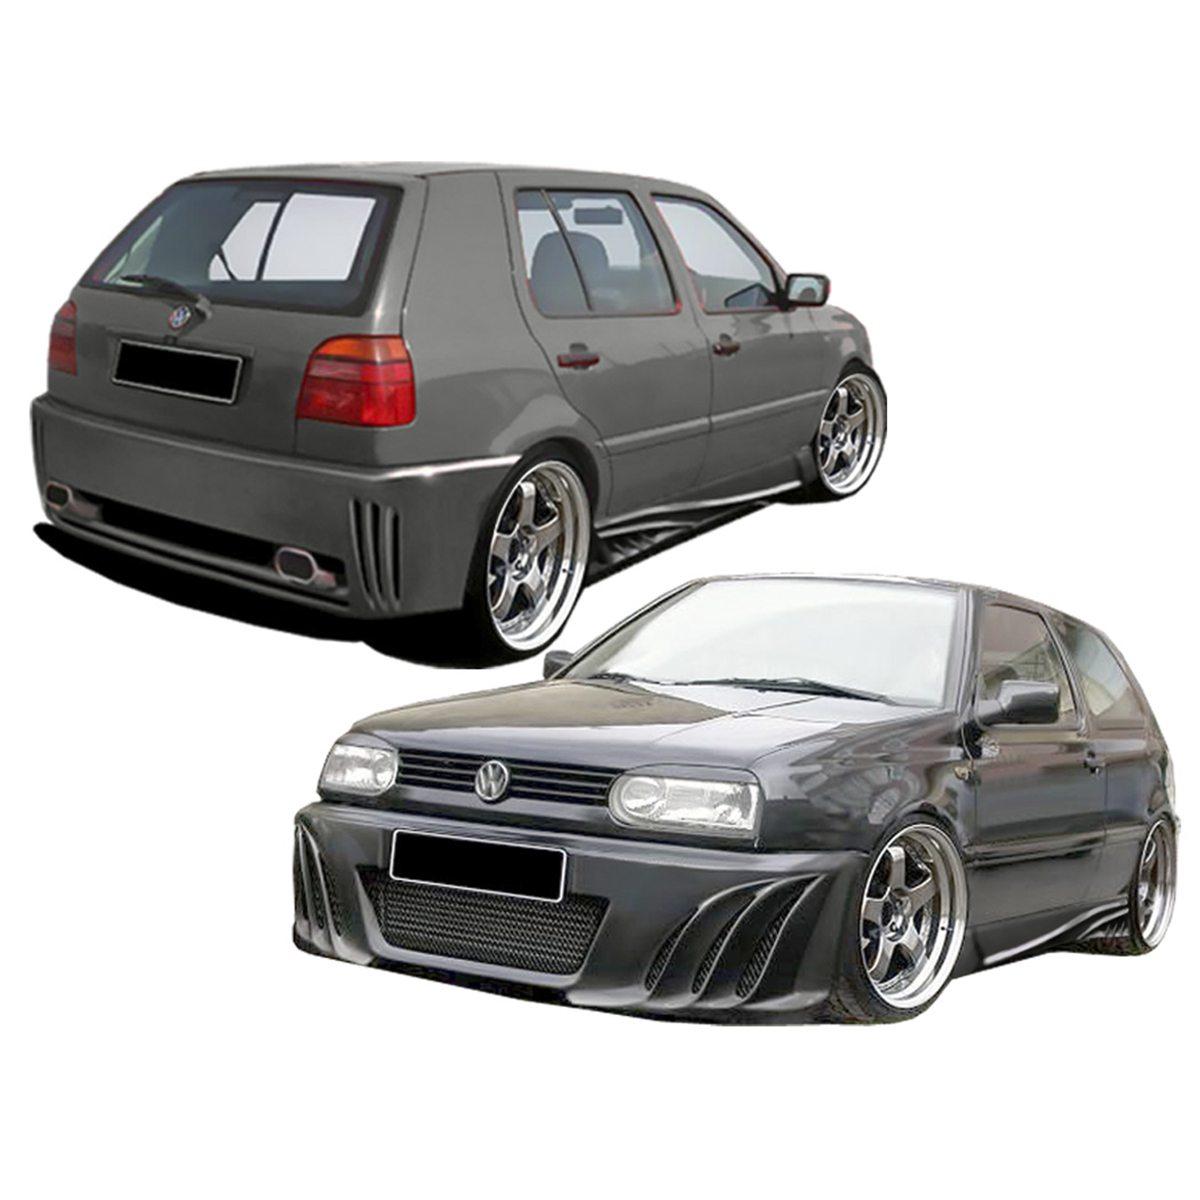 VW-Golf-III-Shark-KIT-KTM017